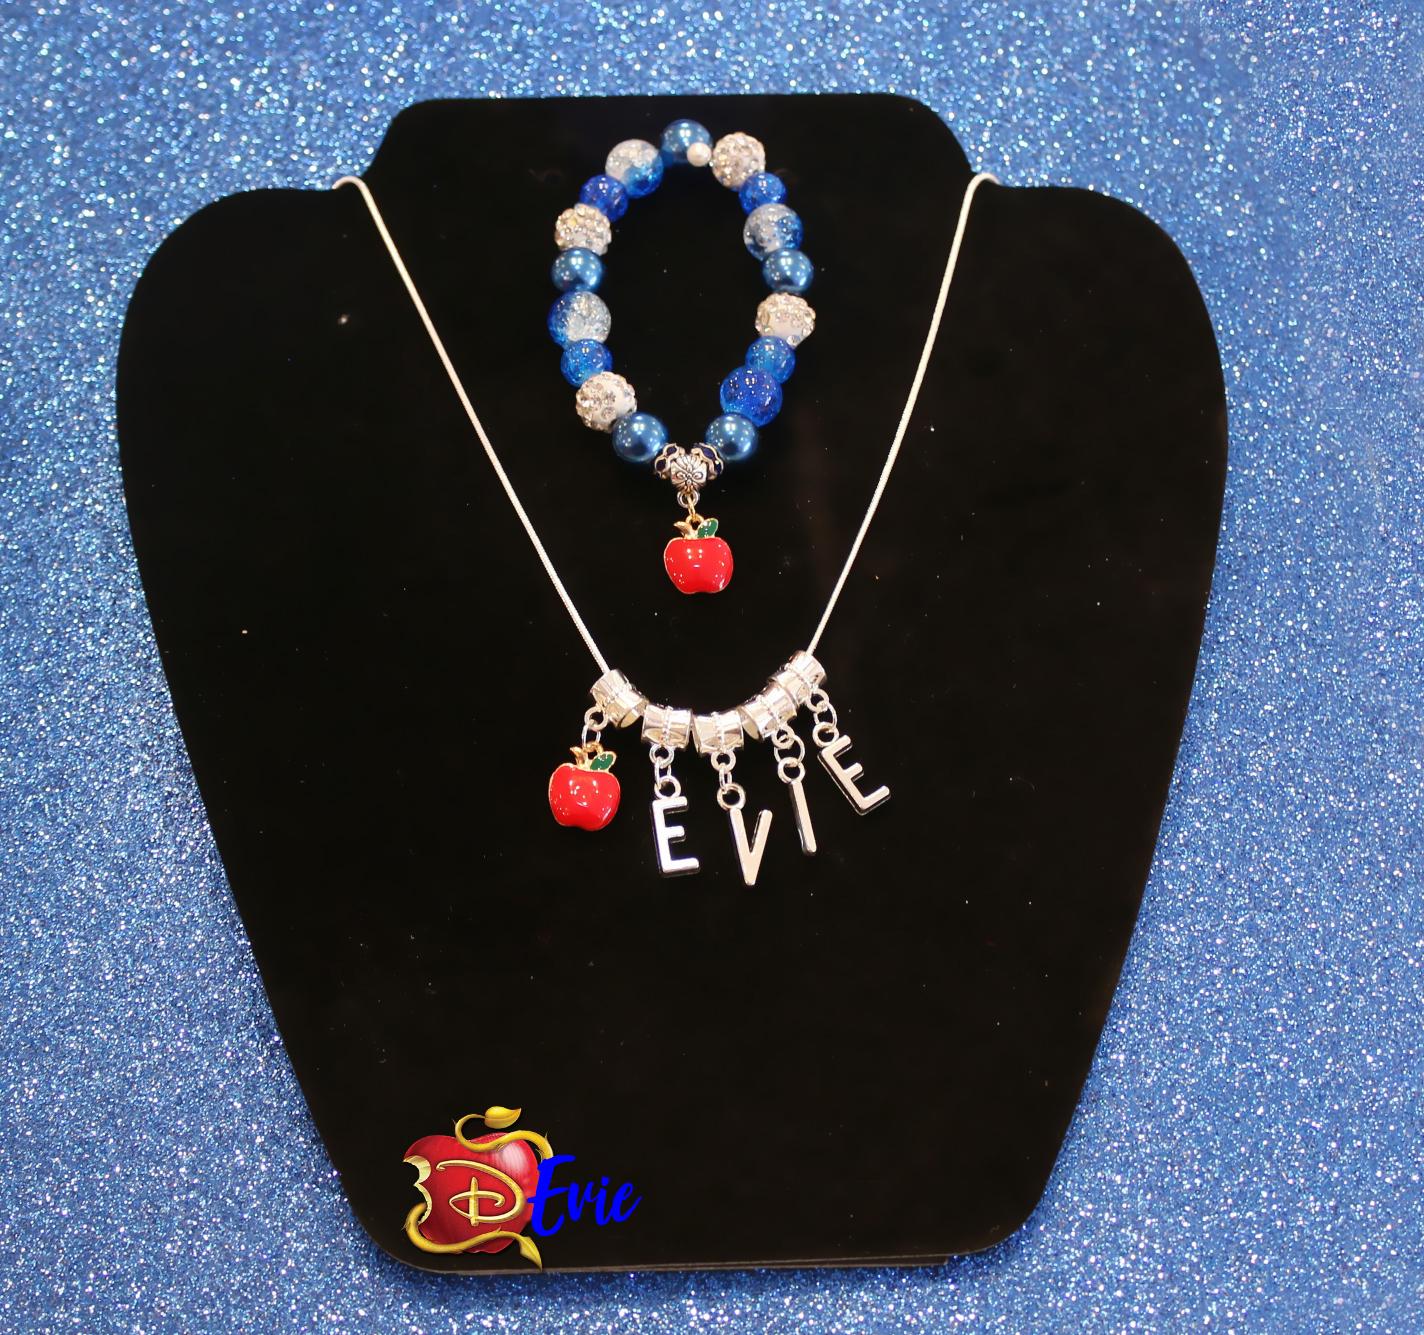 Evie Jewelry Set